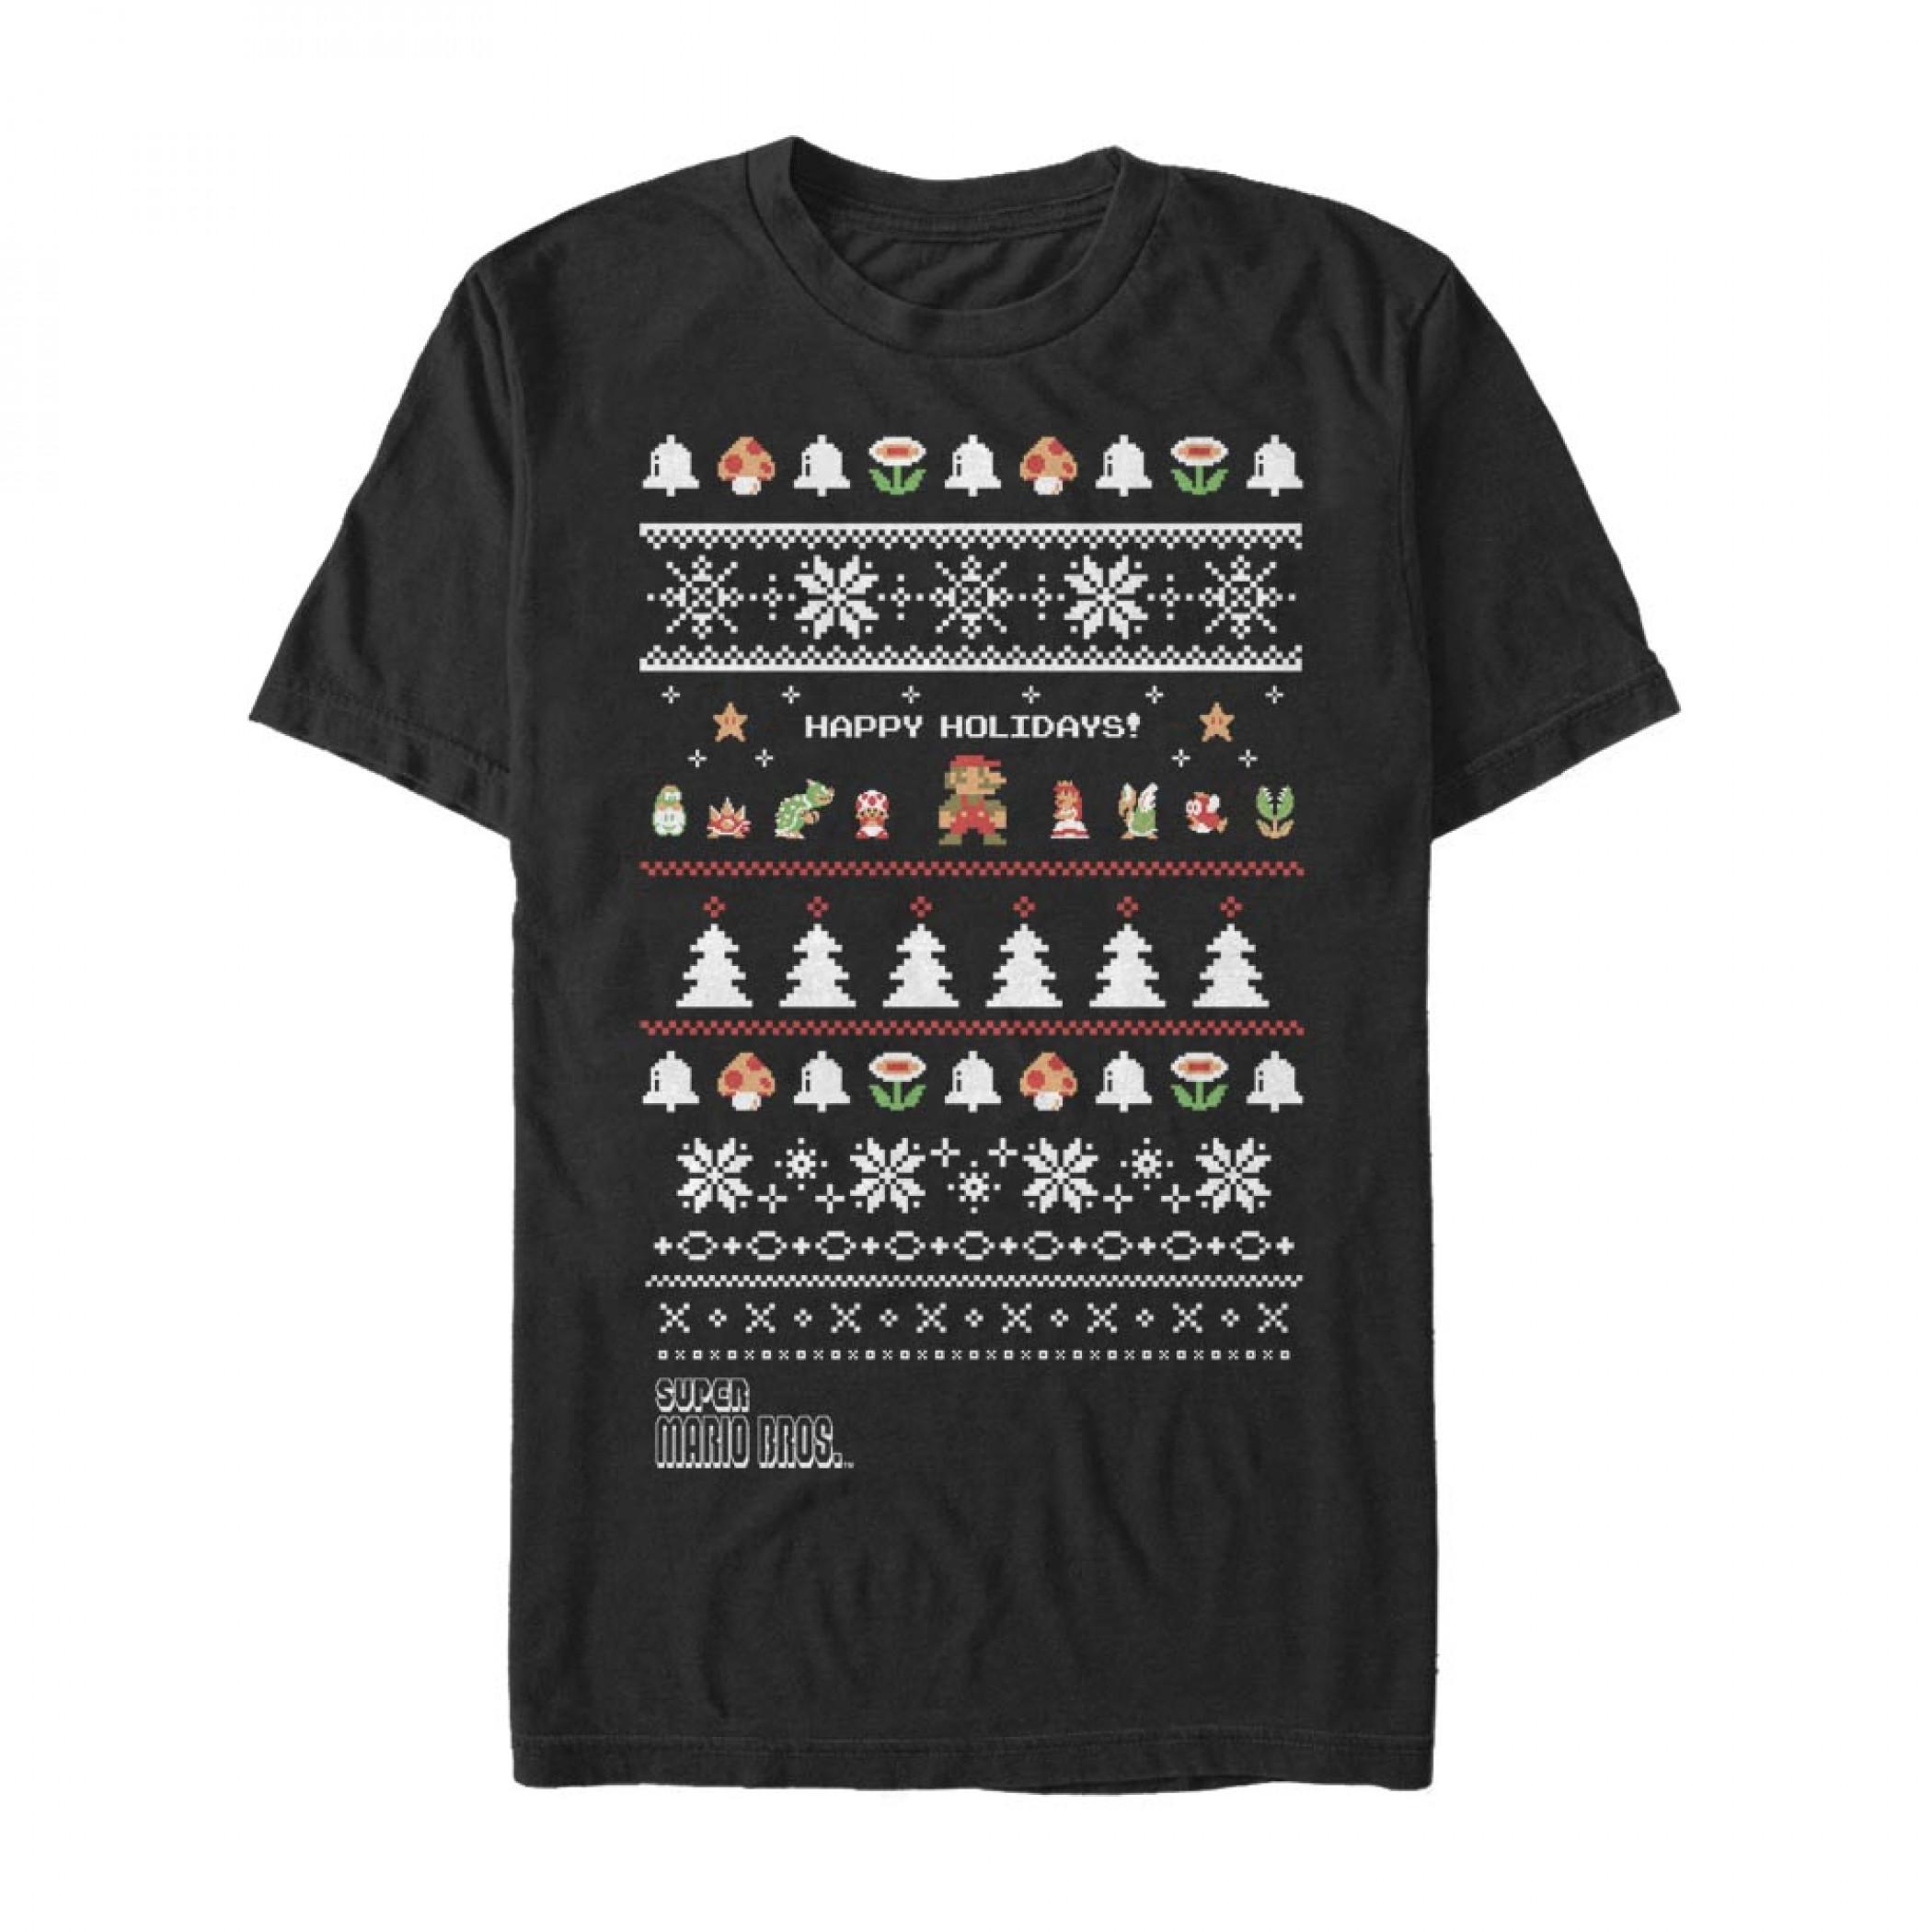 Nintendo Super Mario Bros. Happy Holidays Ugly Sweater Style T-Shirt